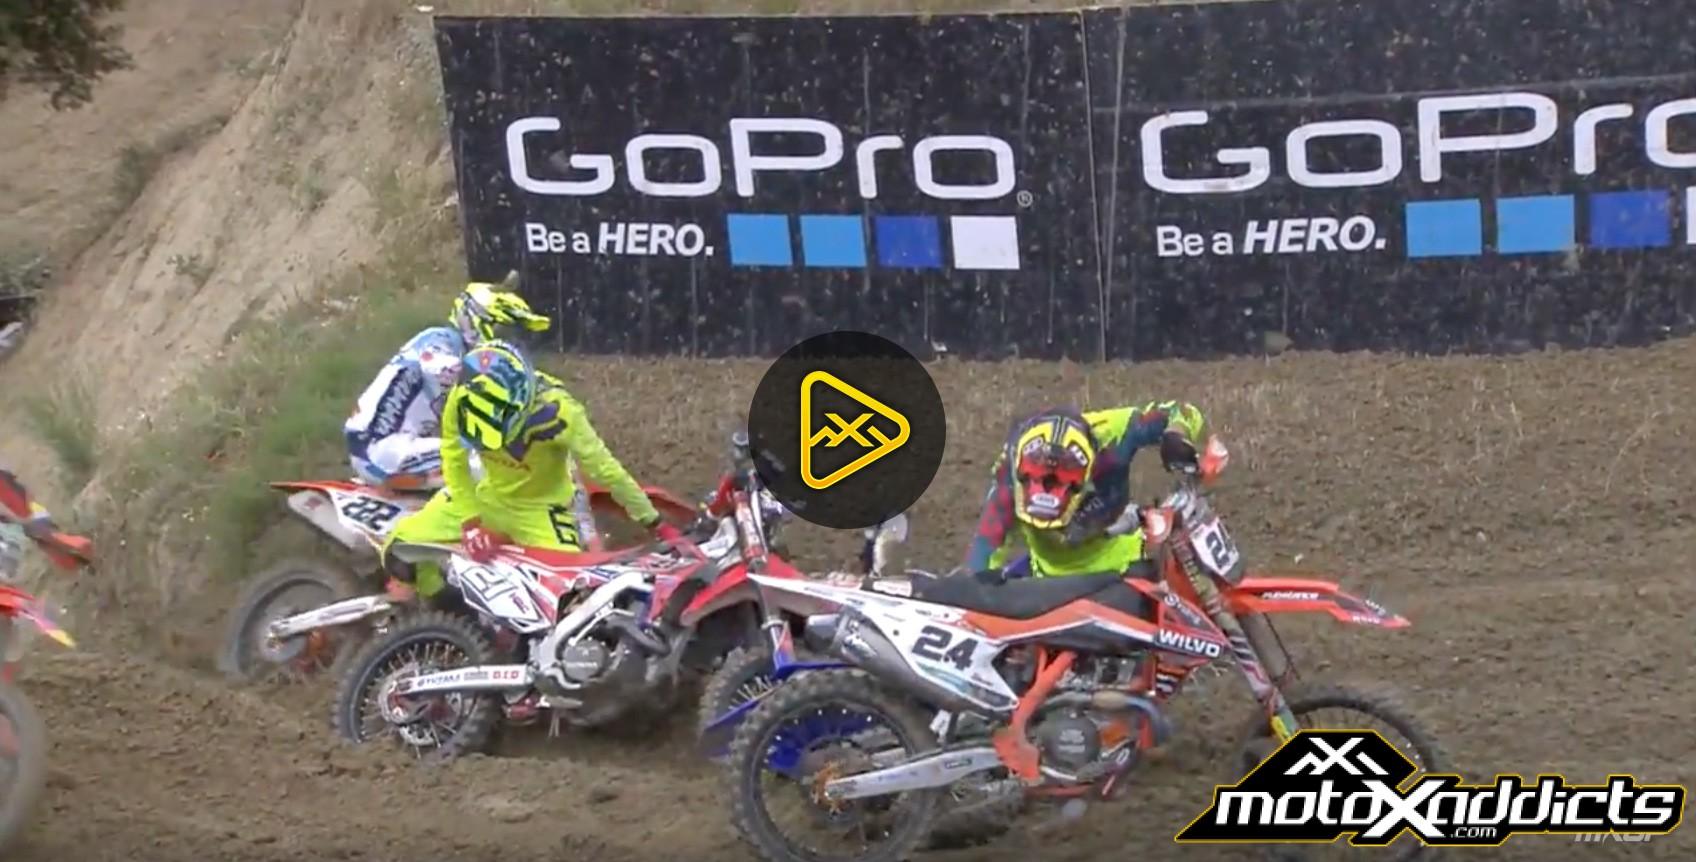 Simpson, Febvre, Paulin & Cairoli Crash at 2016 MXGP of Spain